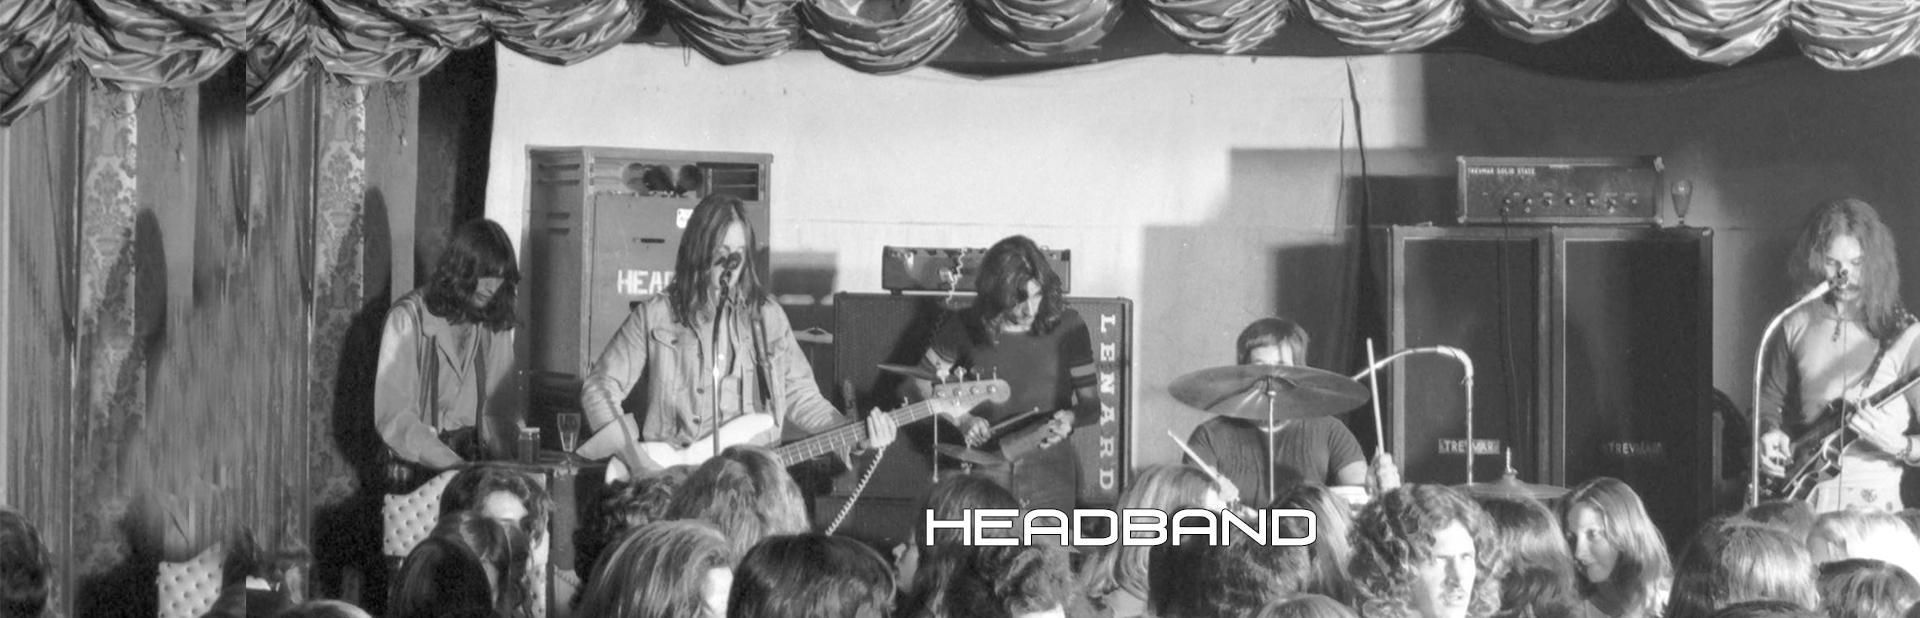 headbead-banner-2